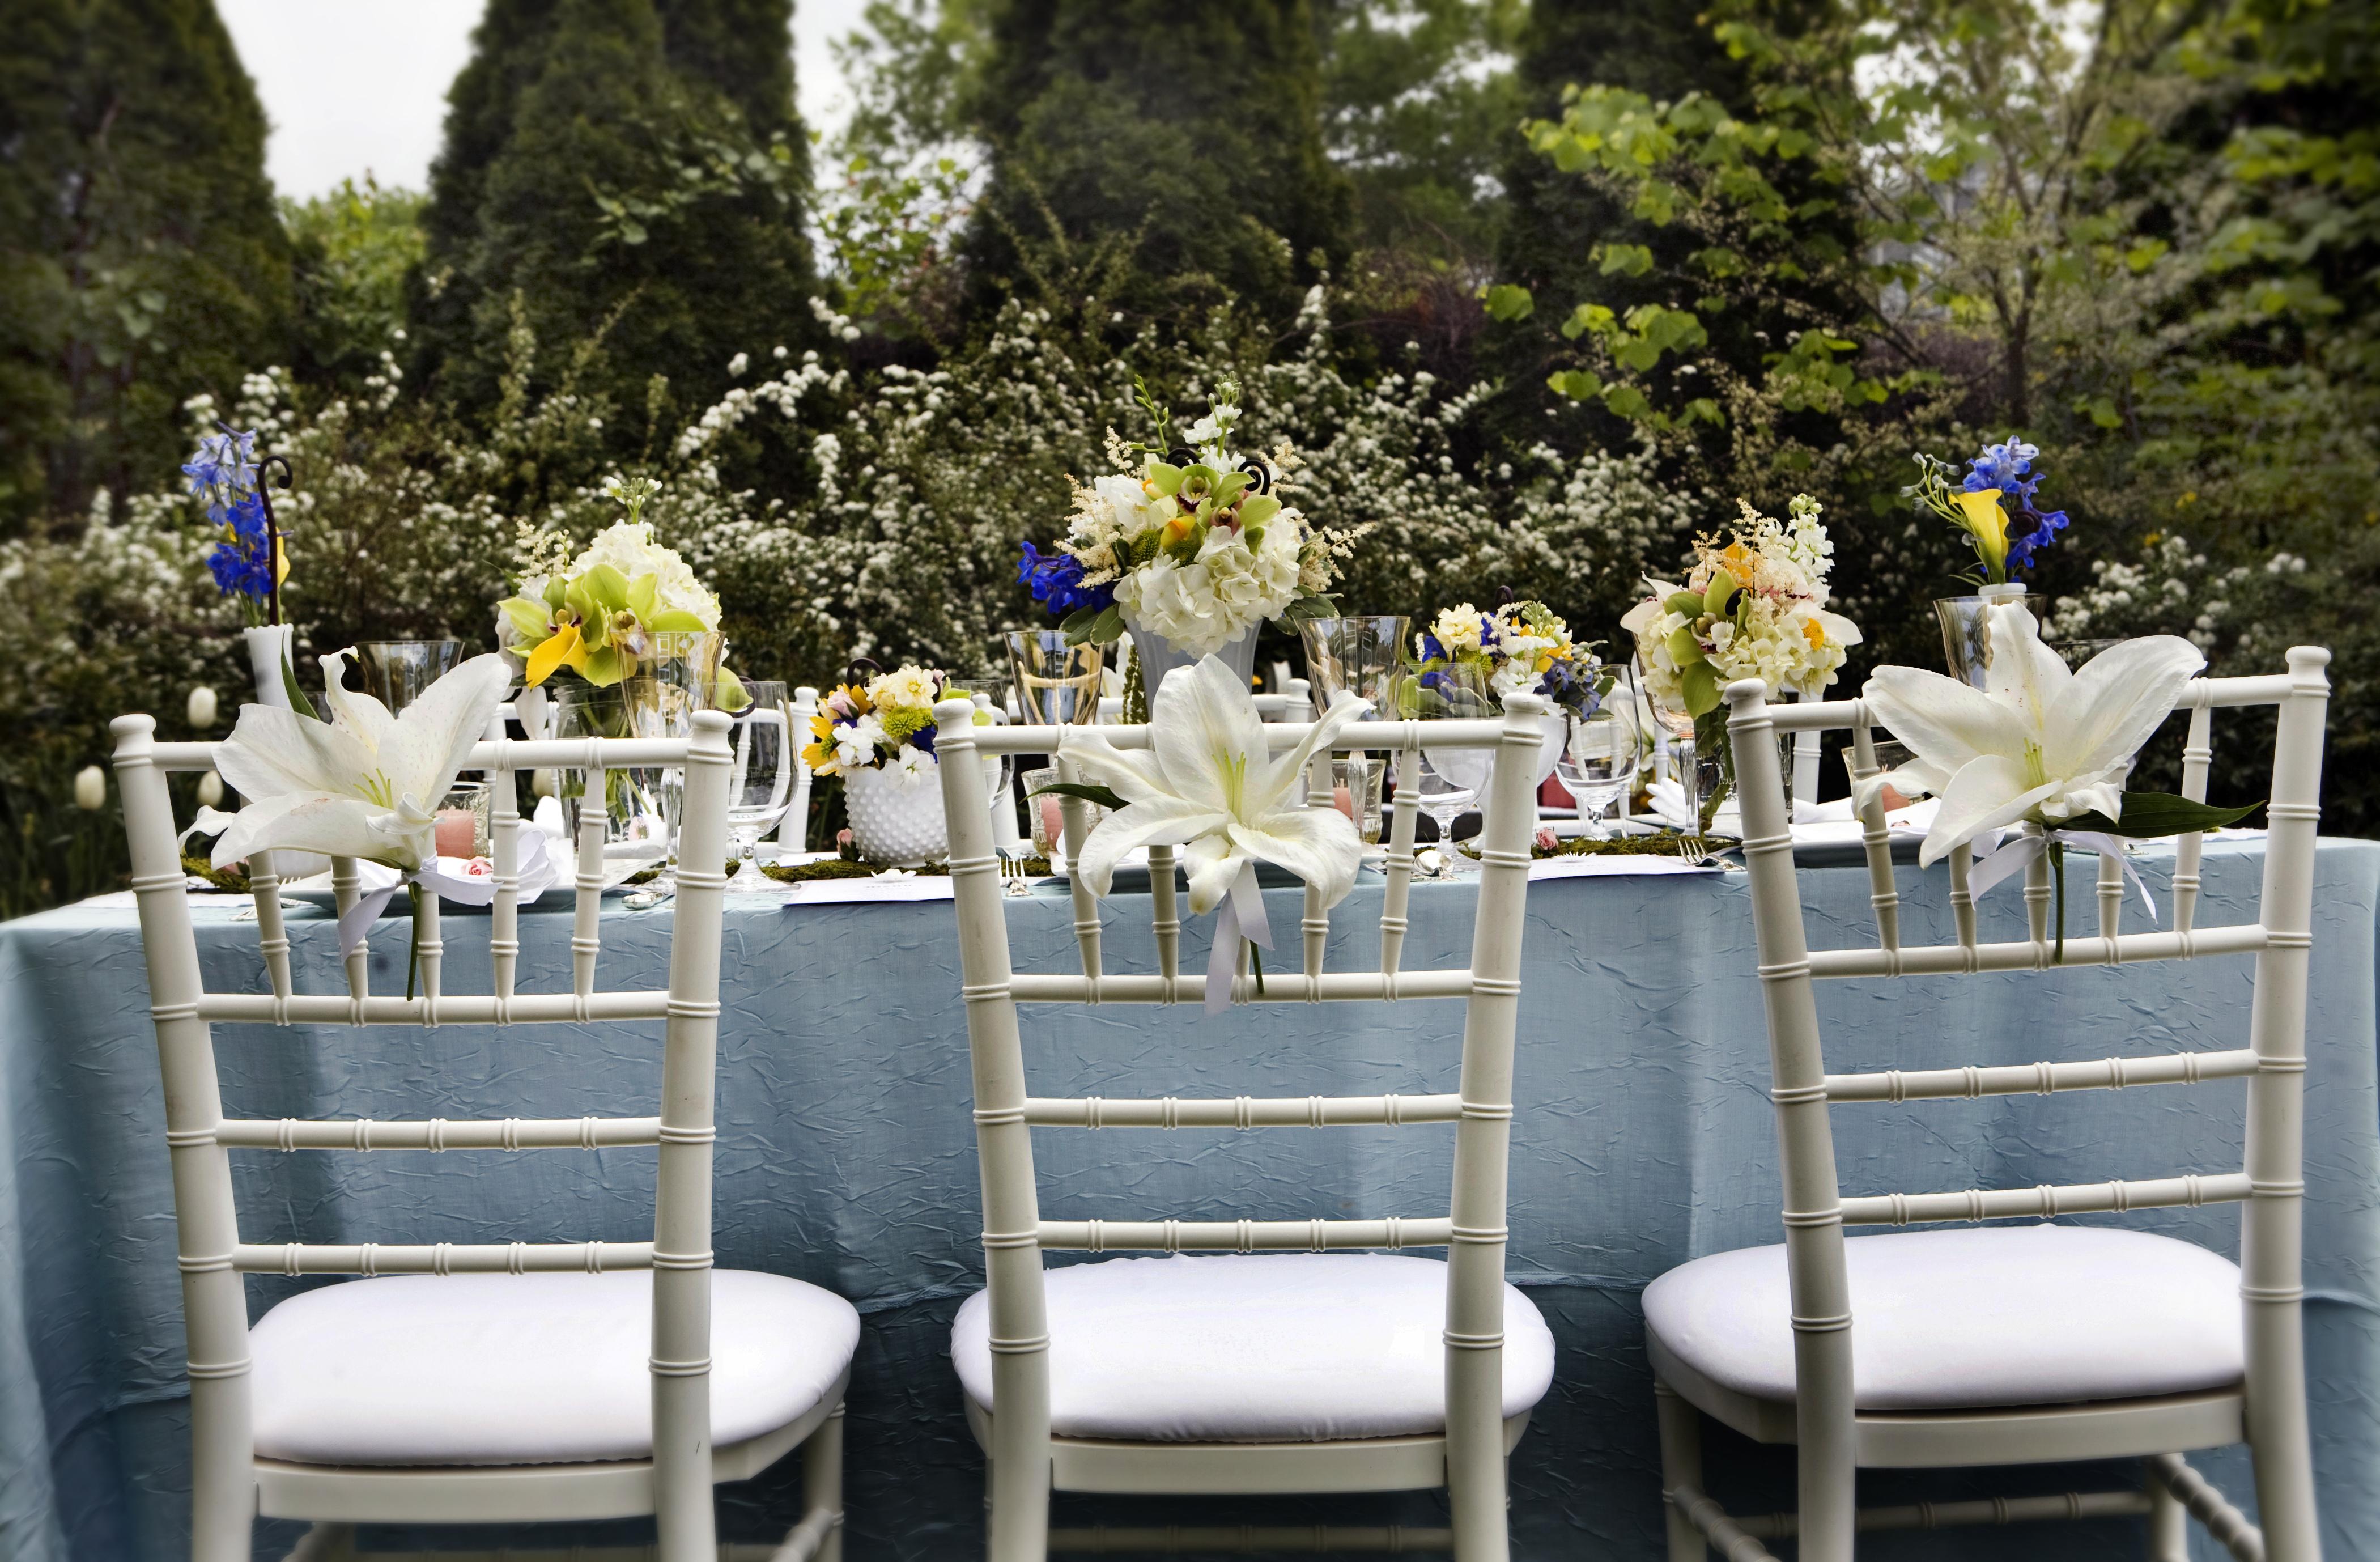 chiavari chair hire wedding london kmart high